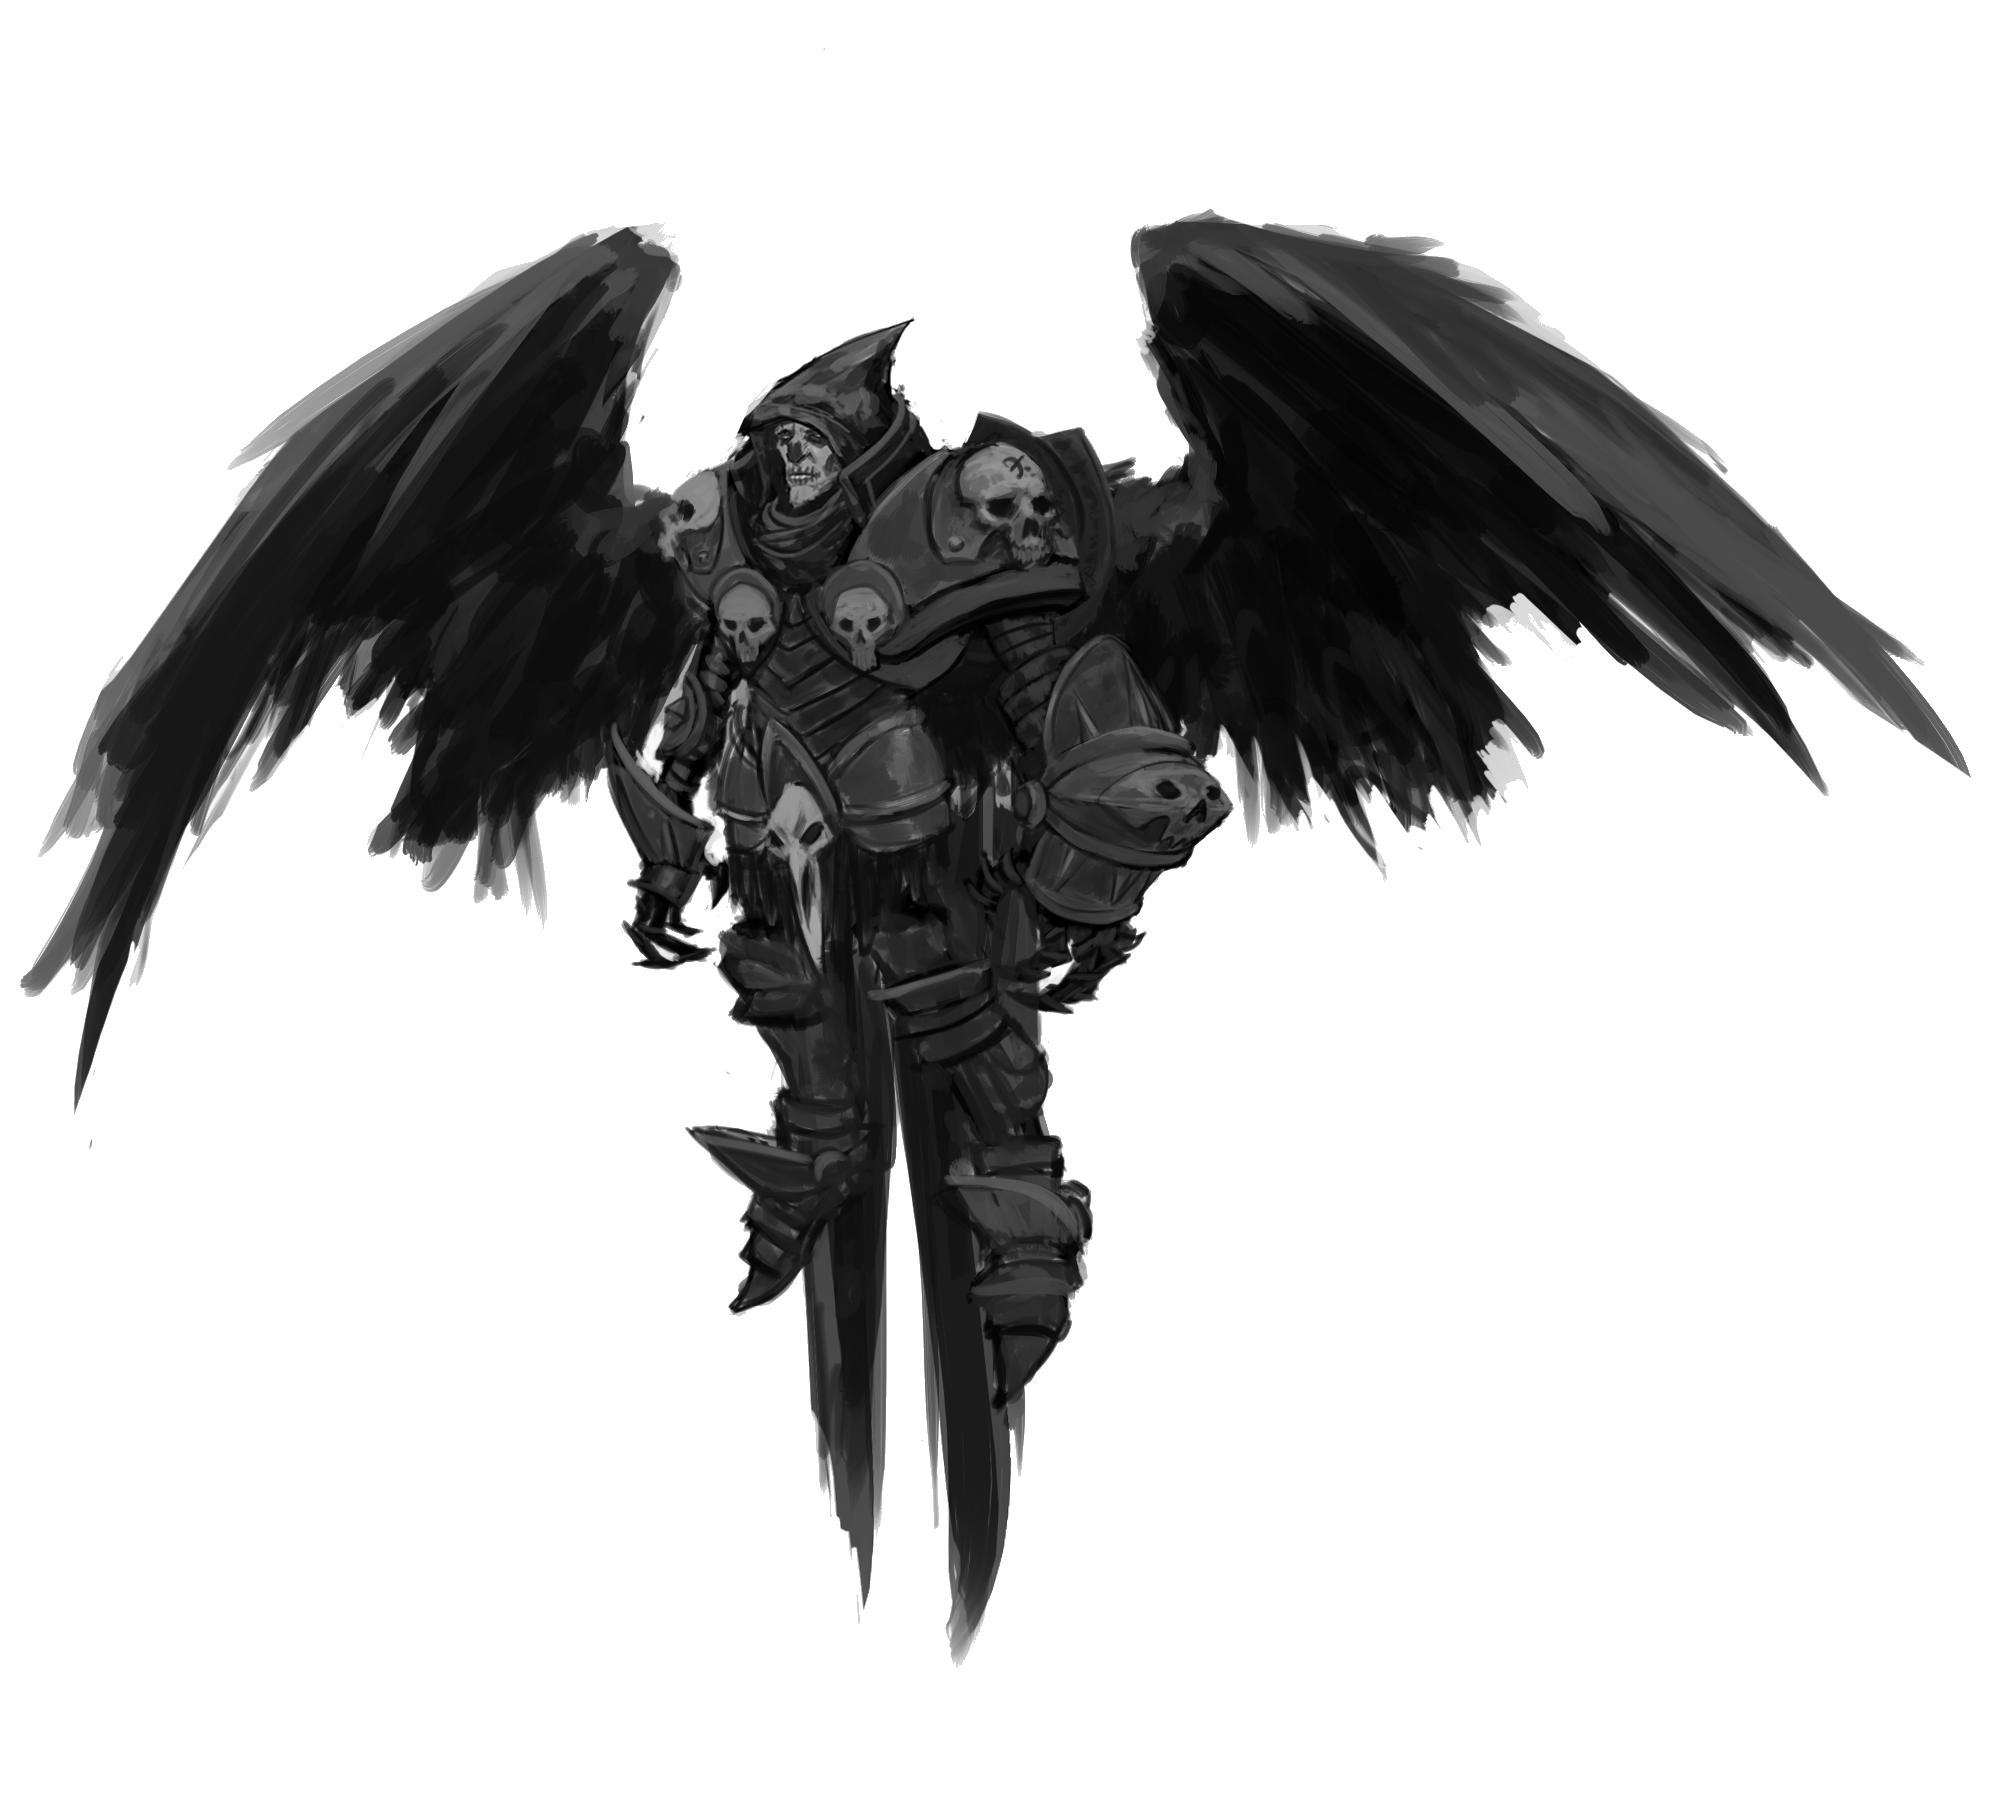 Dark Angel Png - Download Dark Angel Png Images Transparent Gallery. Advertisement, Transparent background PNG HD thumbnail